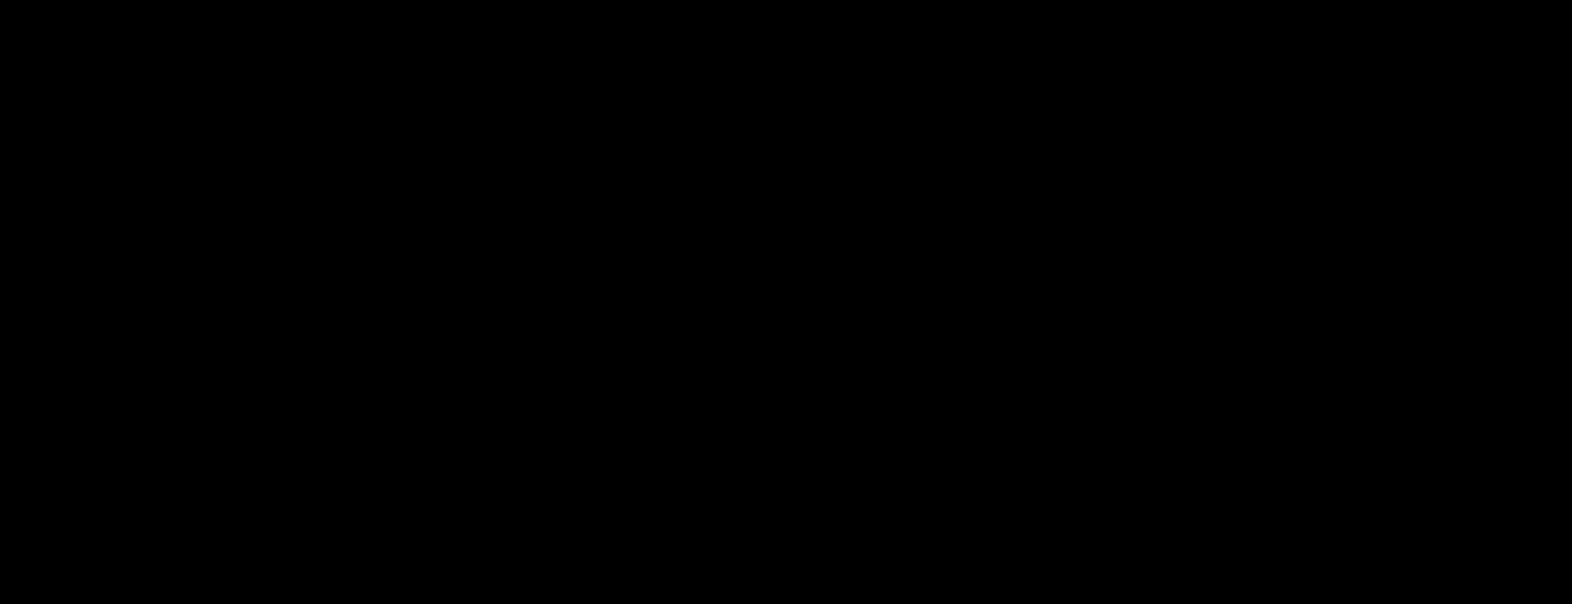 Pōtocol